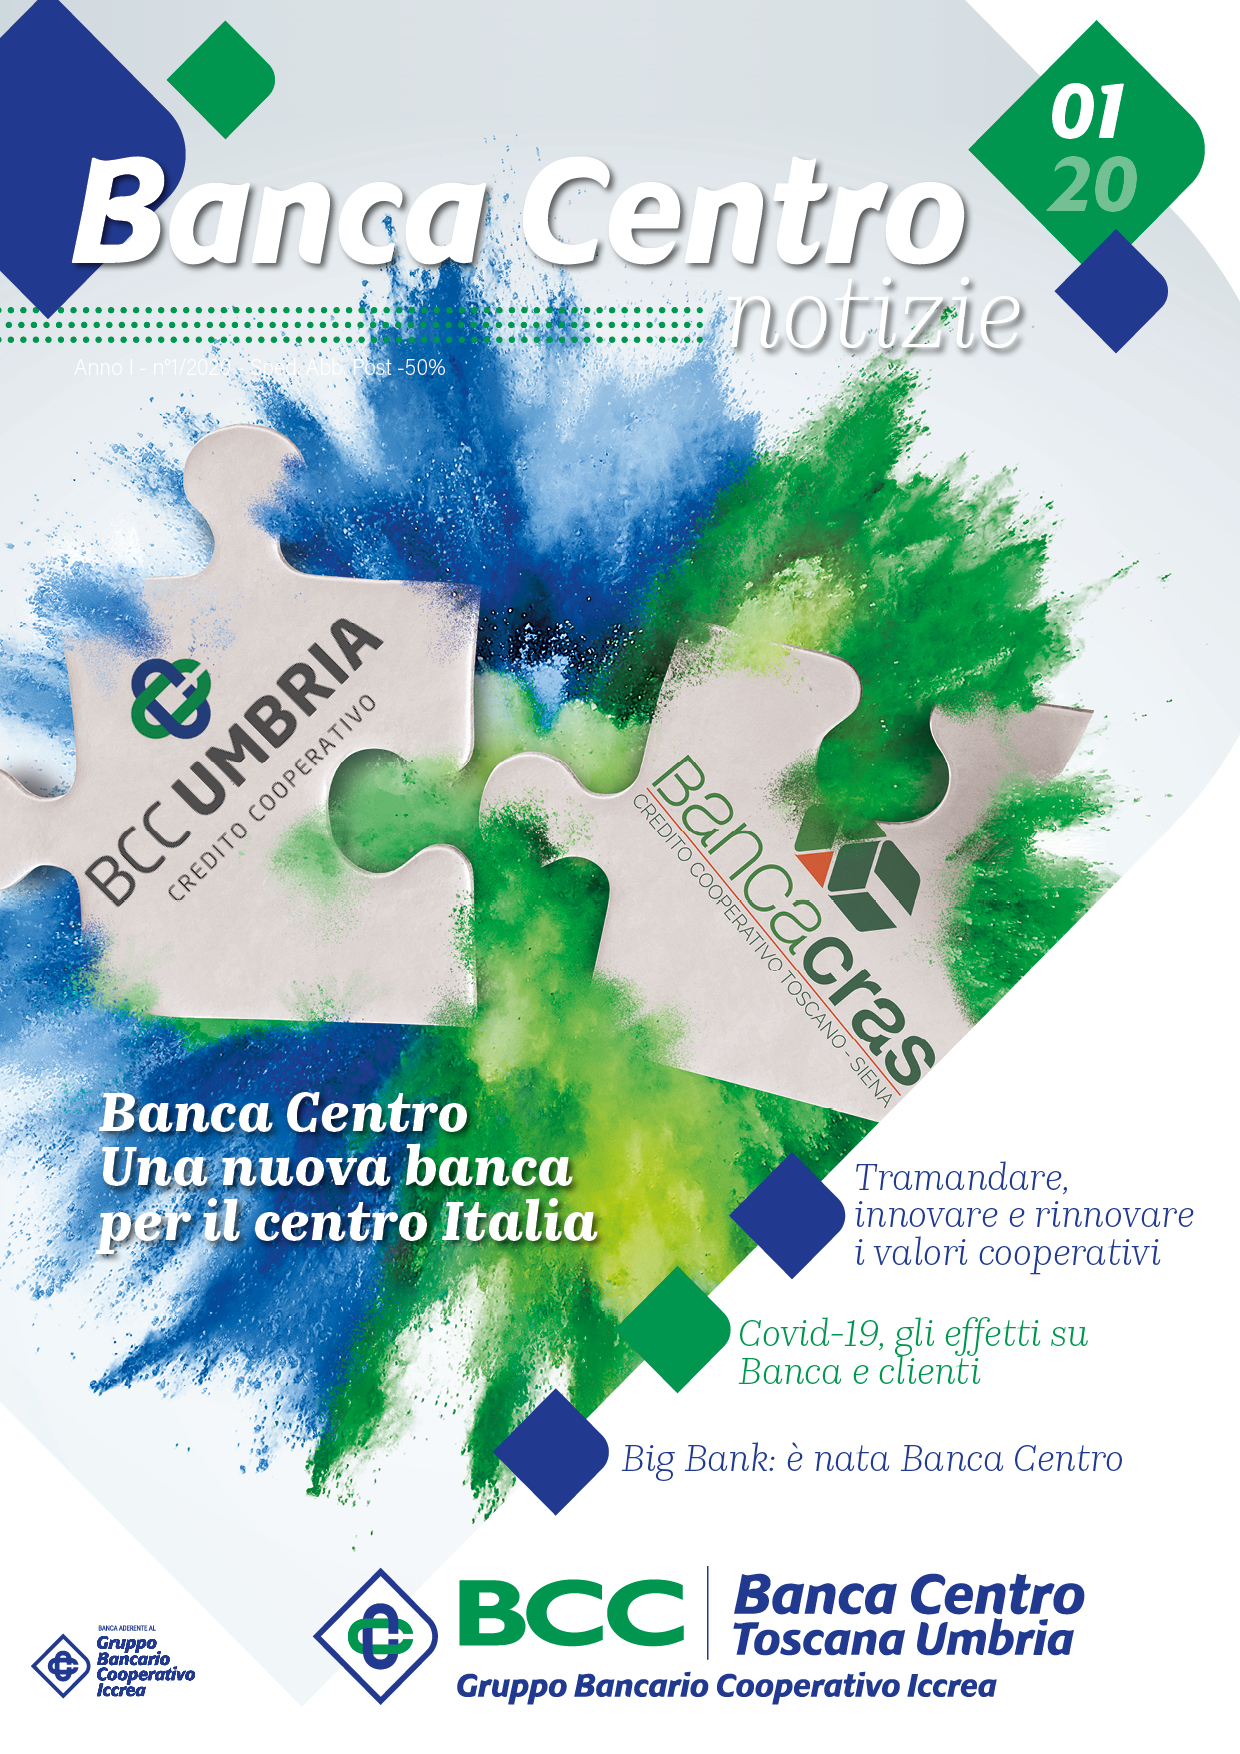 Banca Centro Notizie 1.2020